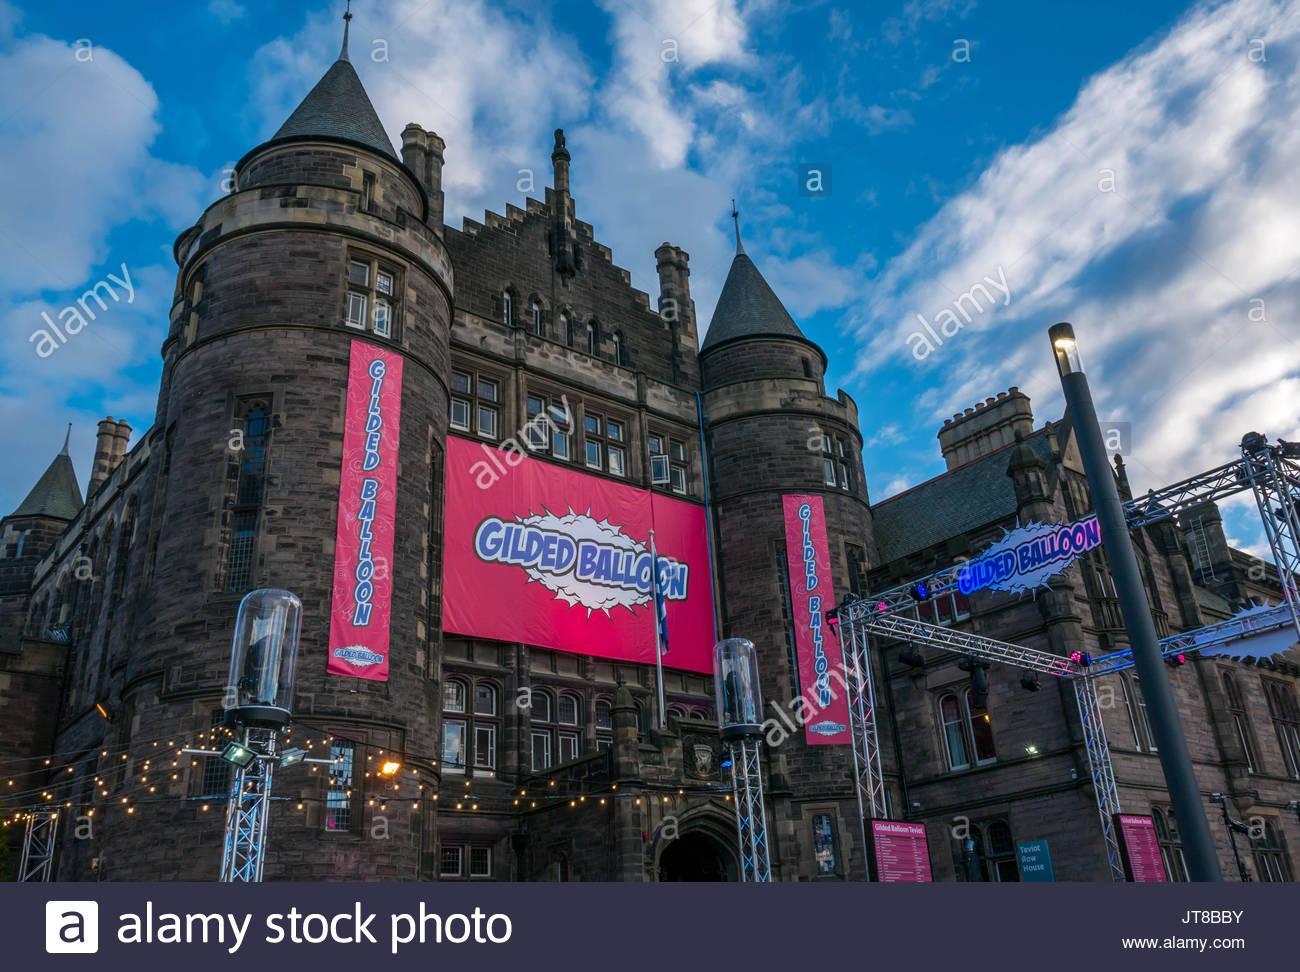 edinburgh-scotland-uk-august-7th-2017-a-